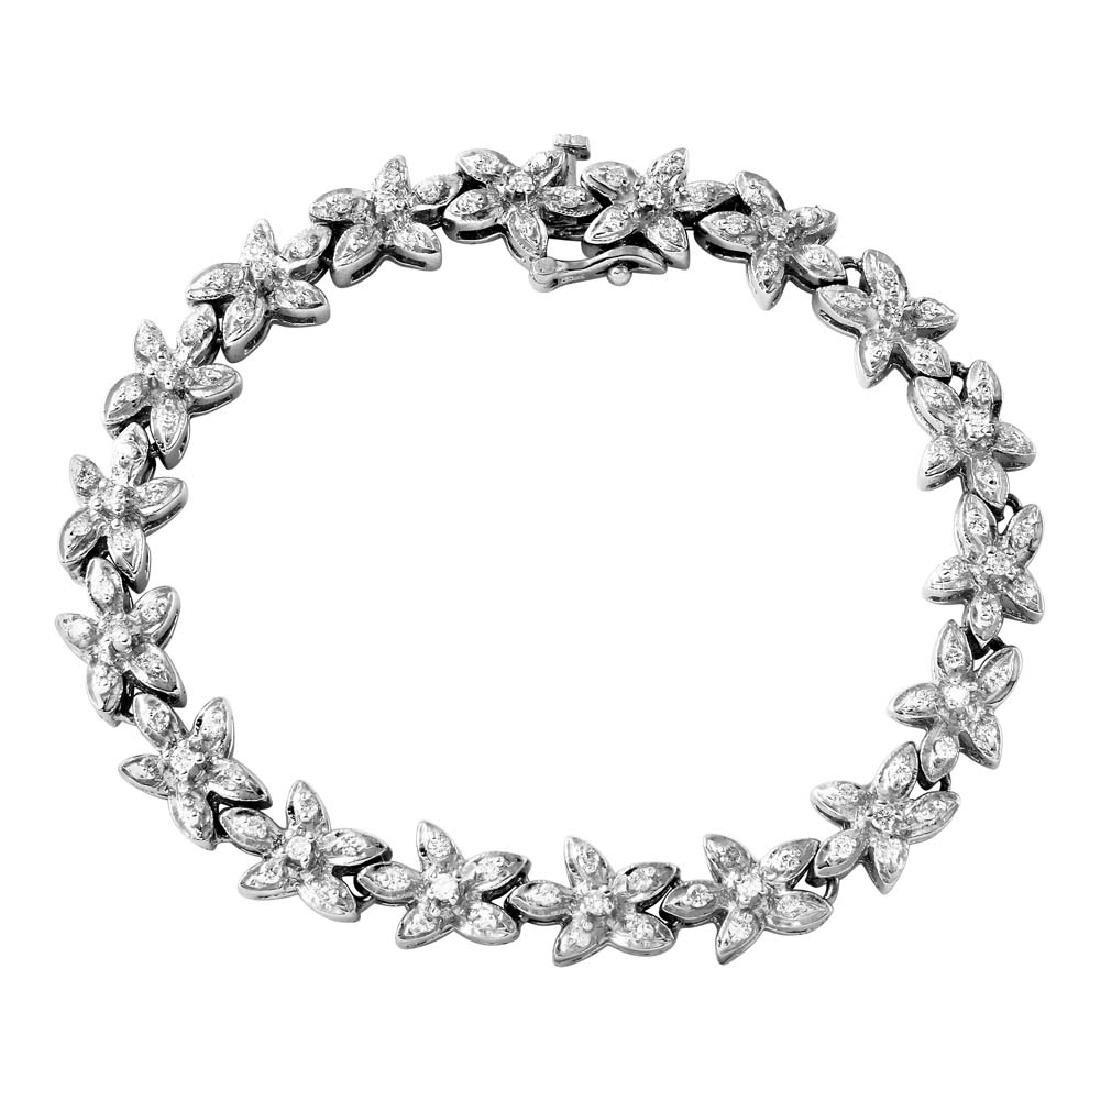 Genuine 1.67 TCW 14K White Gold Ladies Bracelet